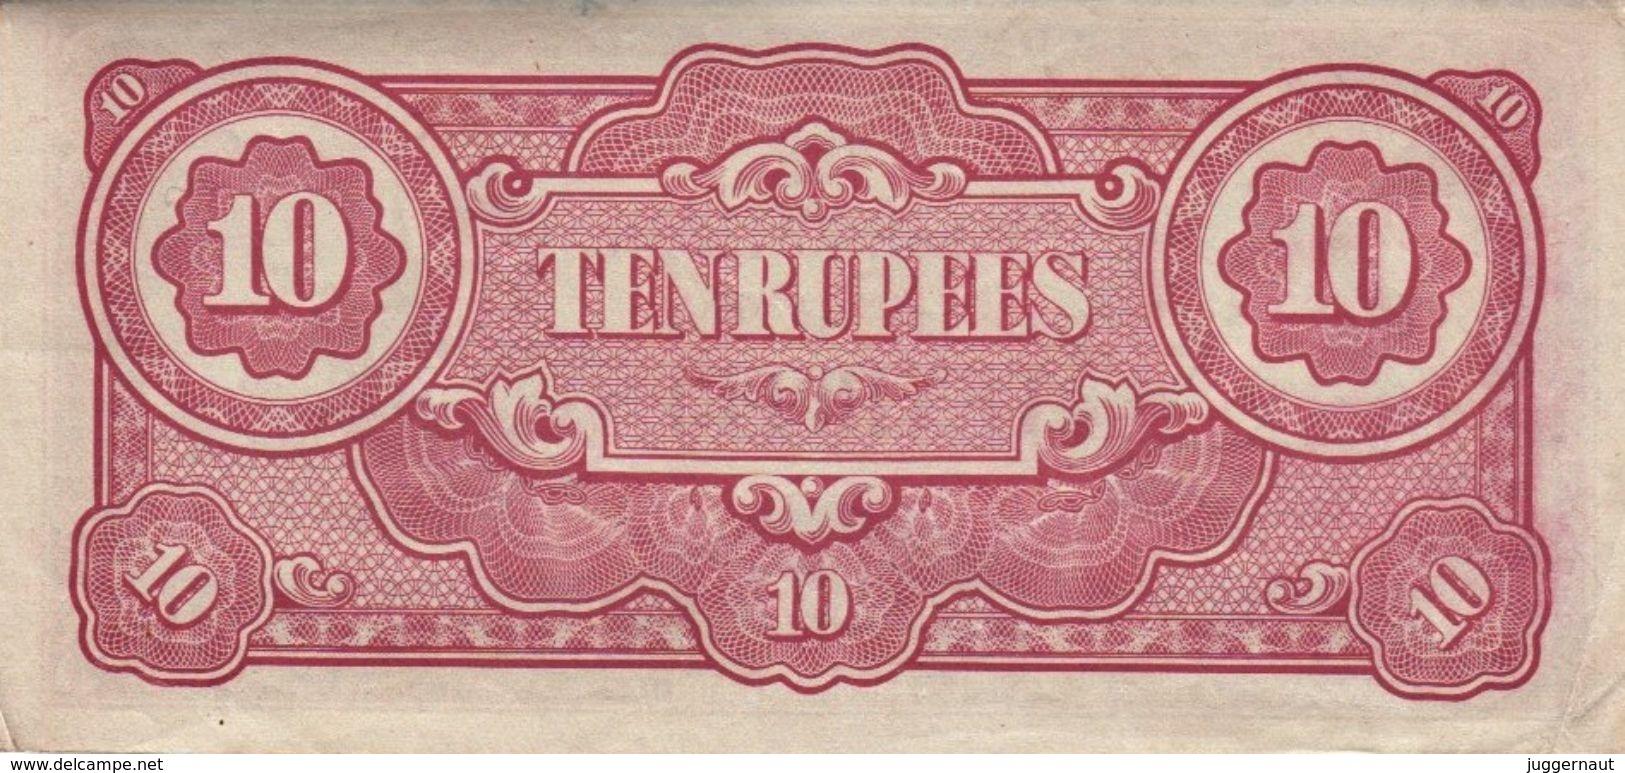 BURMA JAPAN OCCUPATION WWII 10-RUPEES BANKNOTE 1942-44 PICK#16 VERY FINE VF - Myanmar